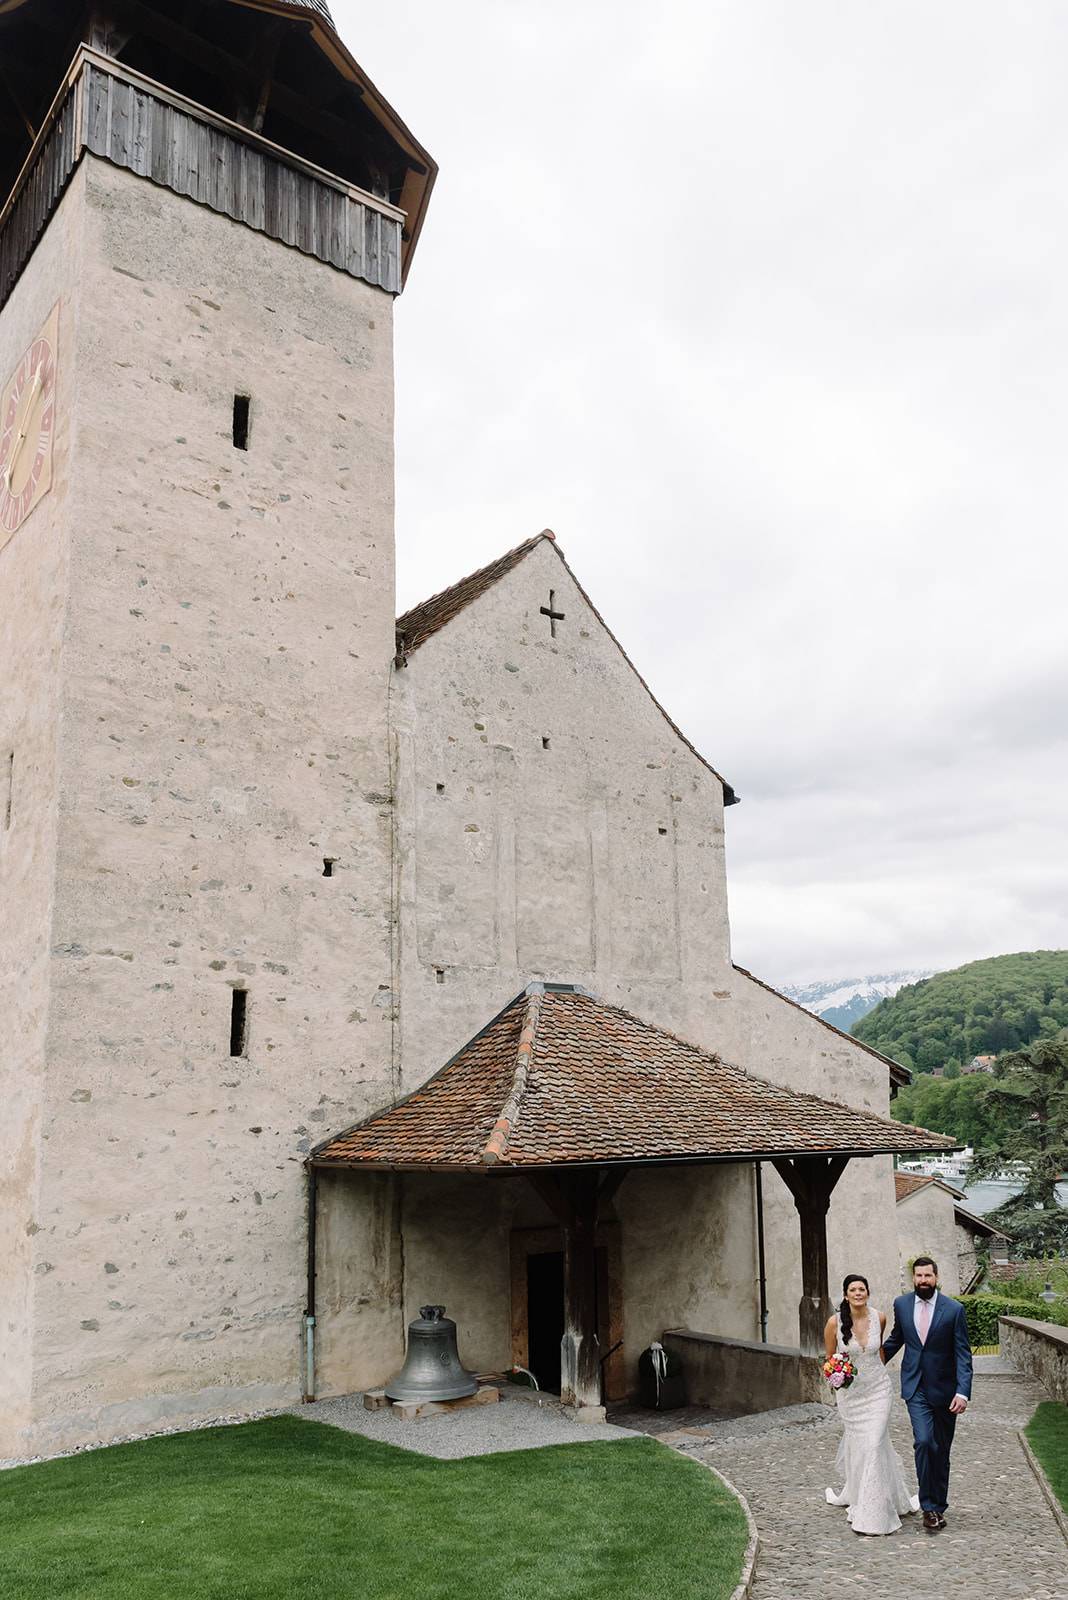 Spiez Castle Elopement, Spiez Castle Elopement In Switzerland